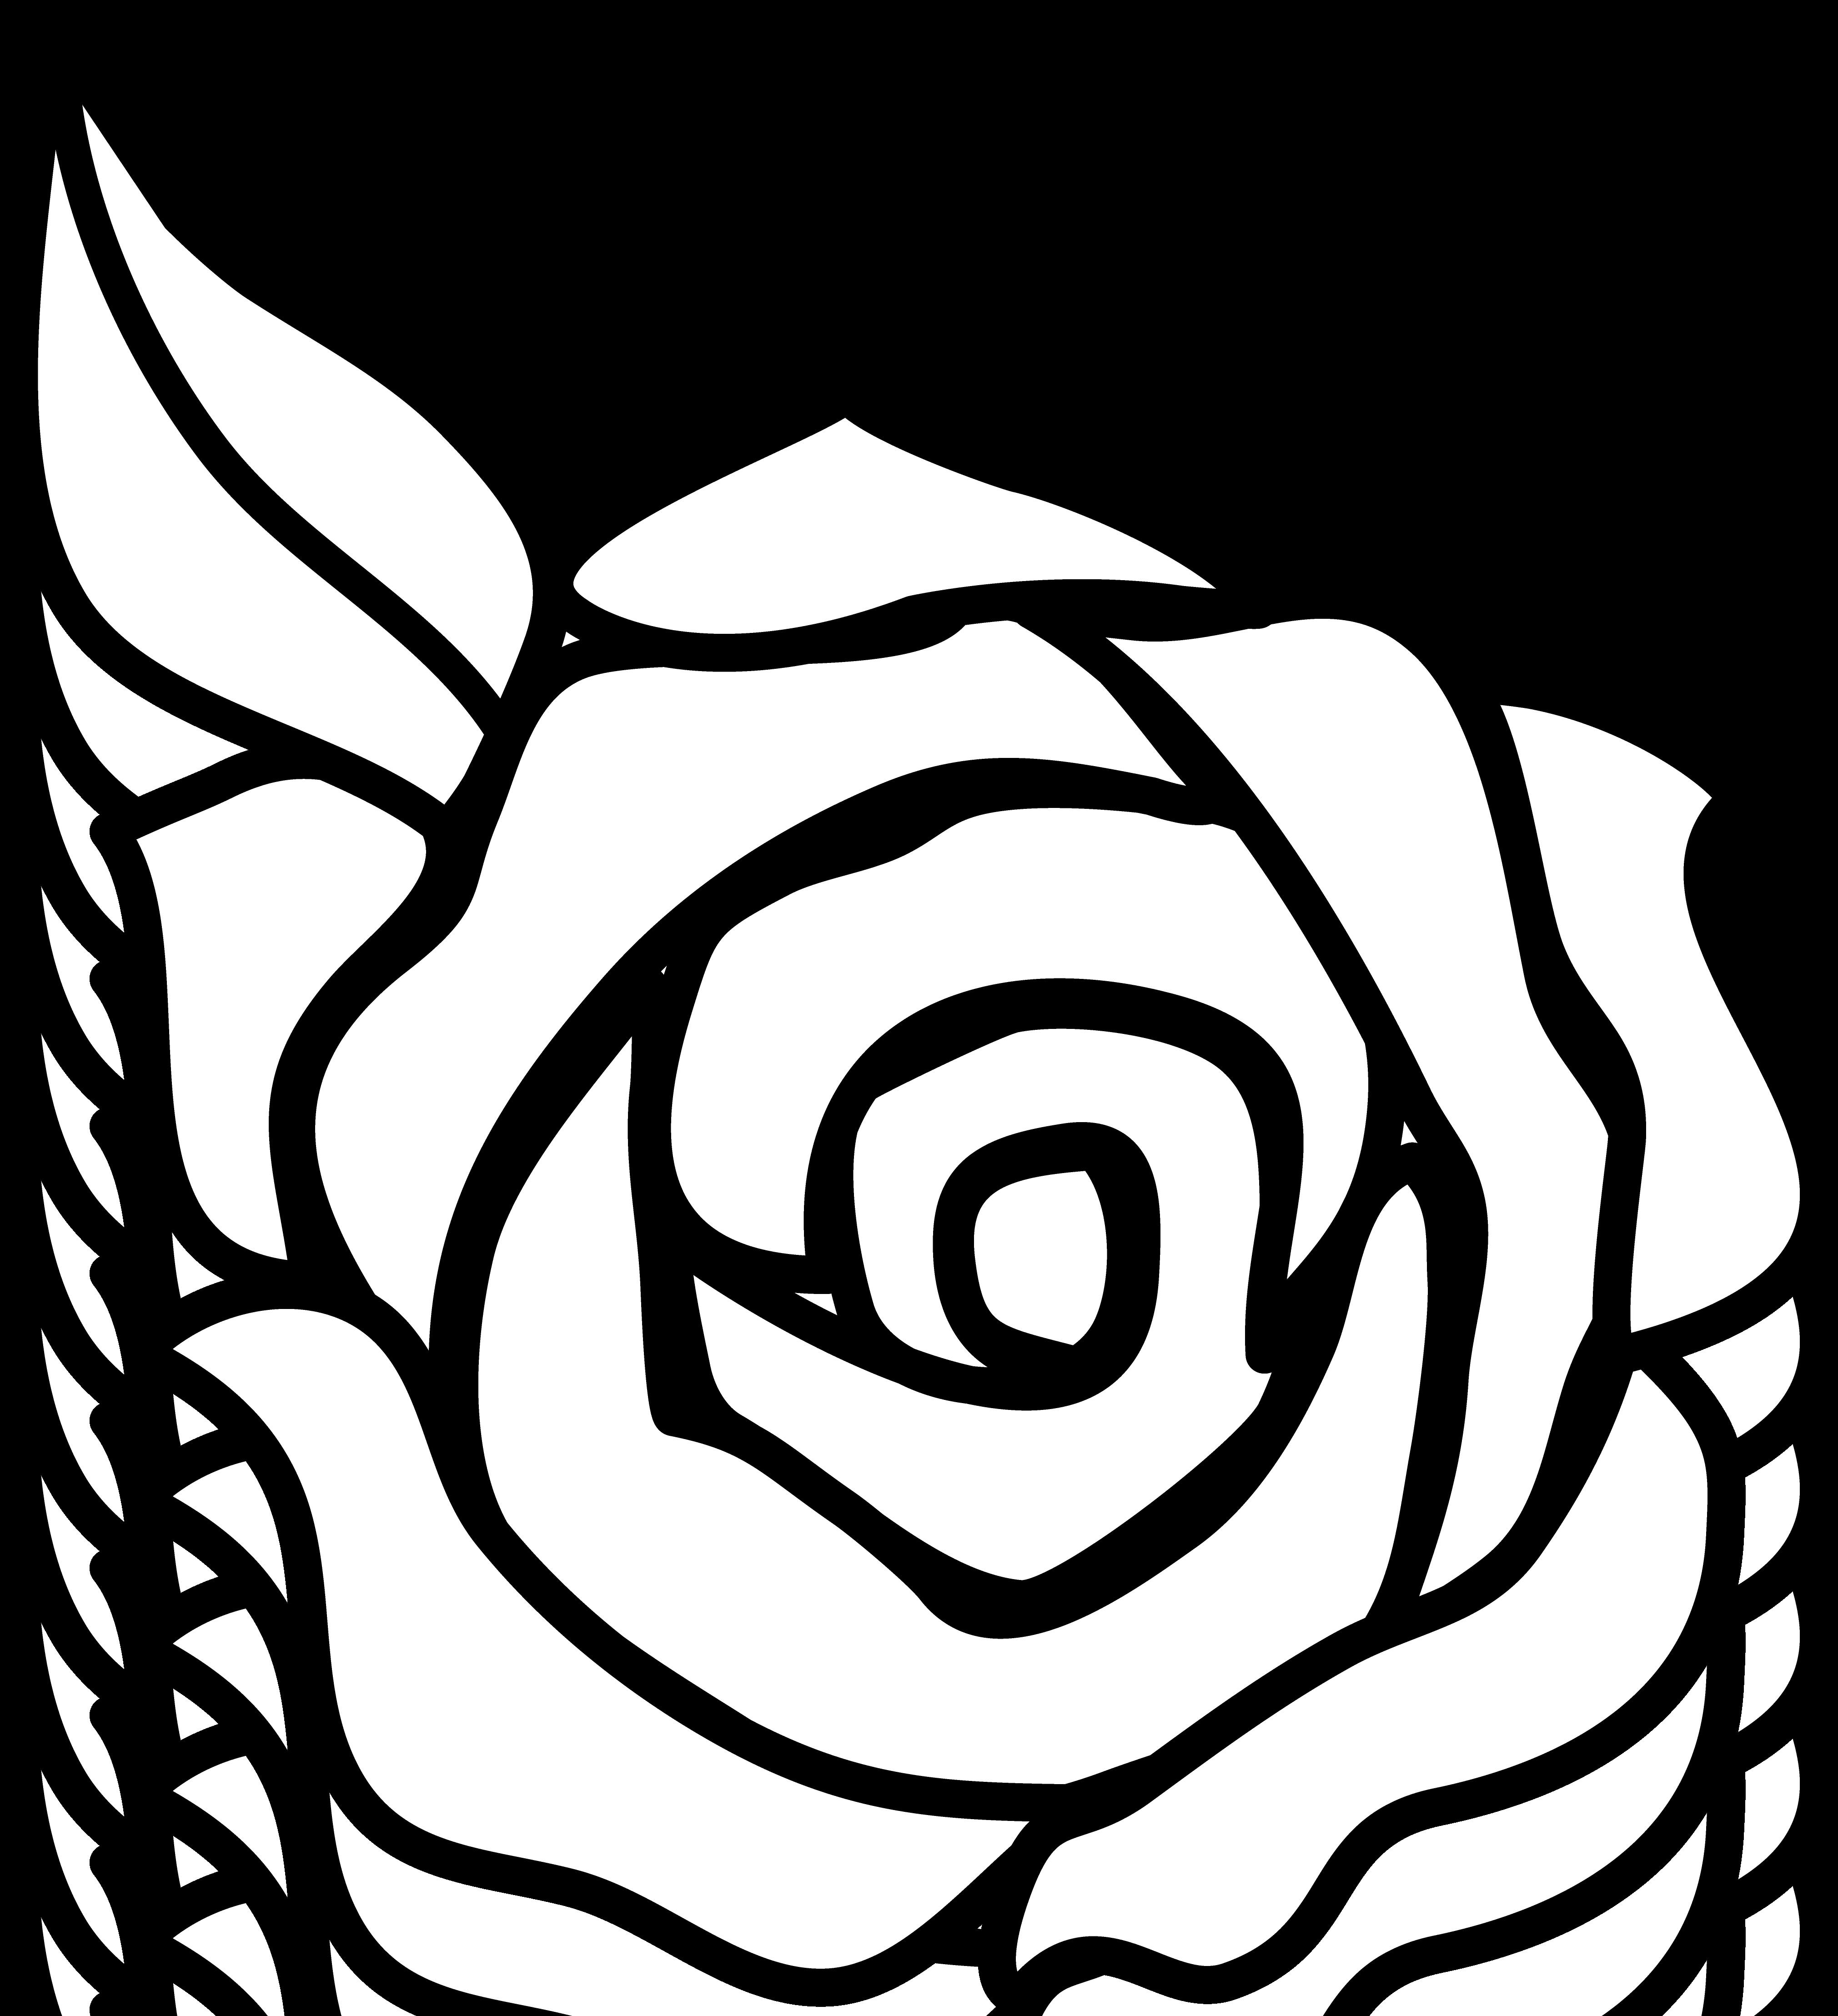 White Rose Clipart-Clipartlook.com-4042-White Rose Clipart-Clipartlook.com-4042-10